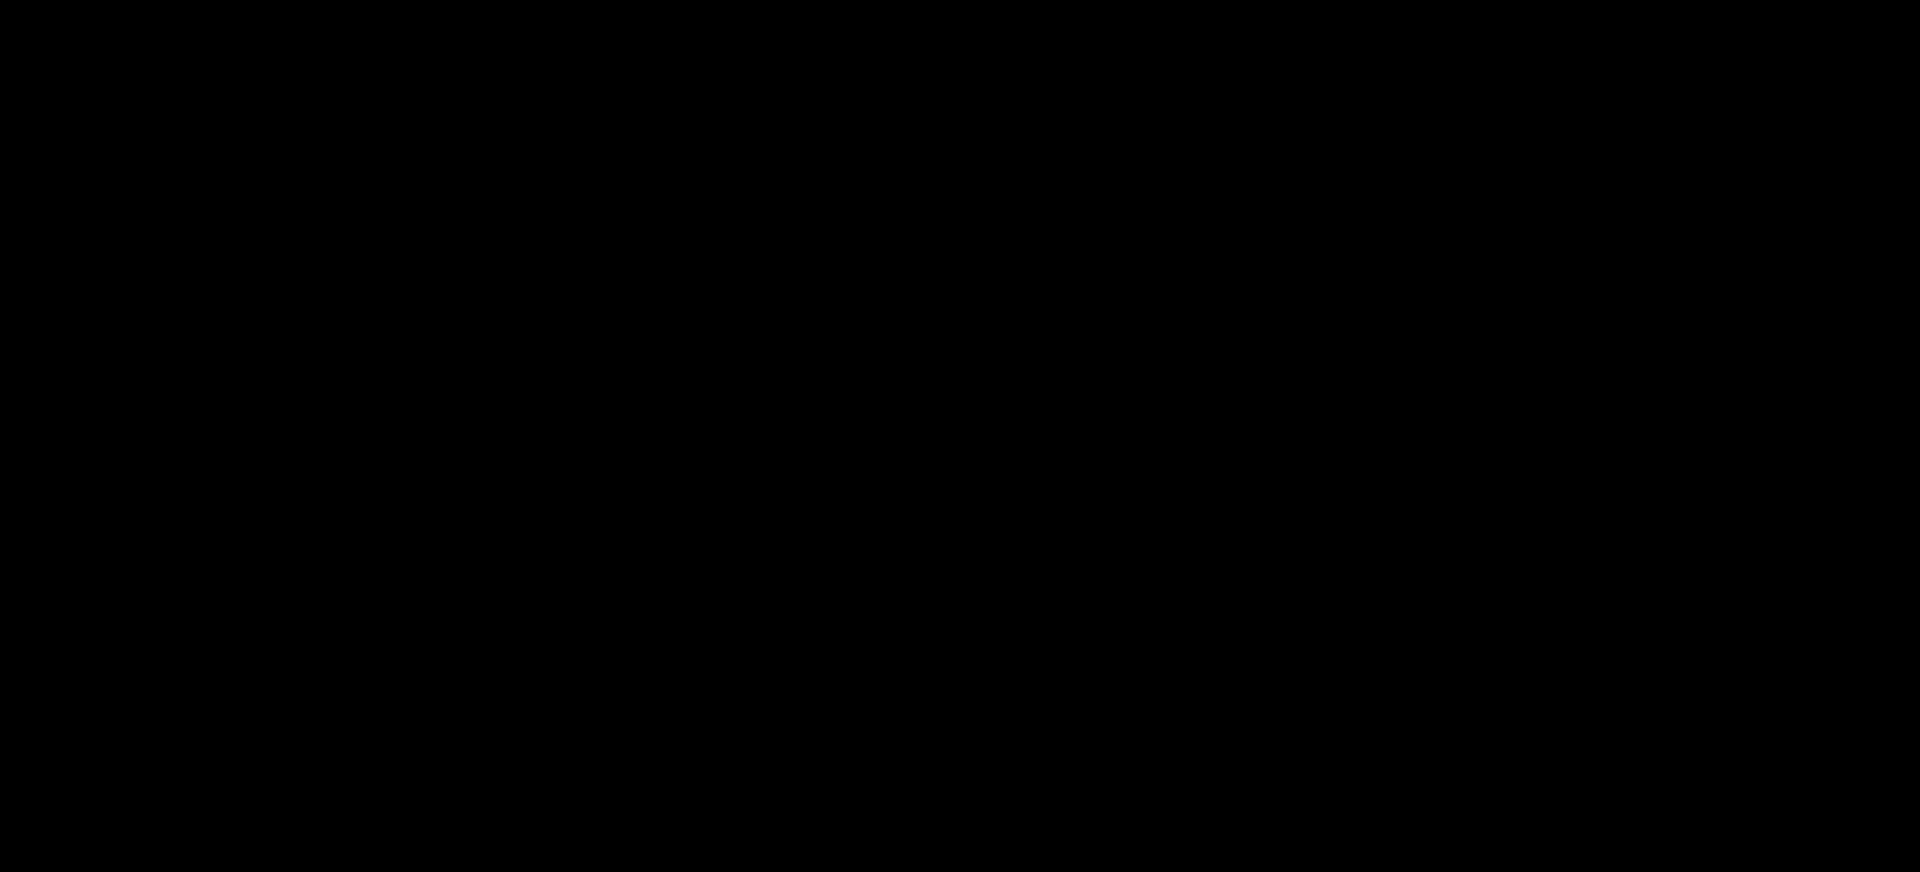 PF-Windows-2